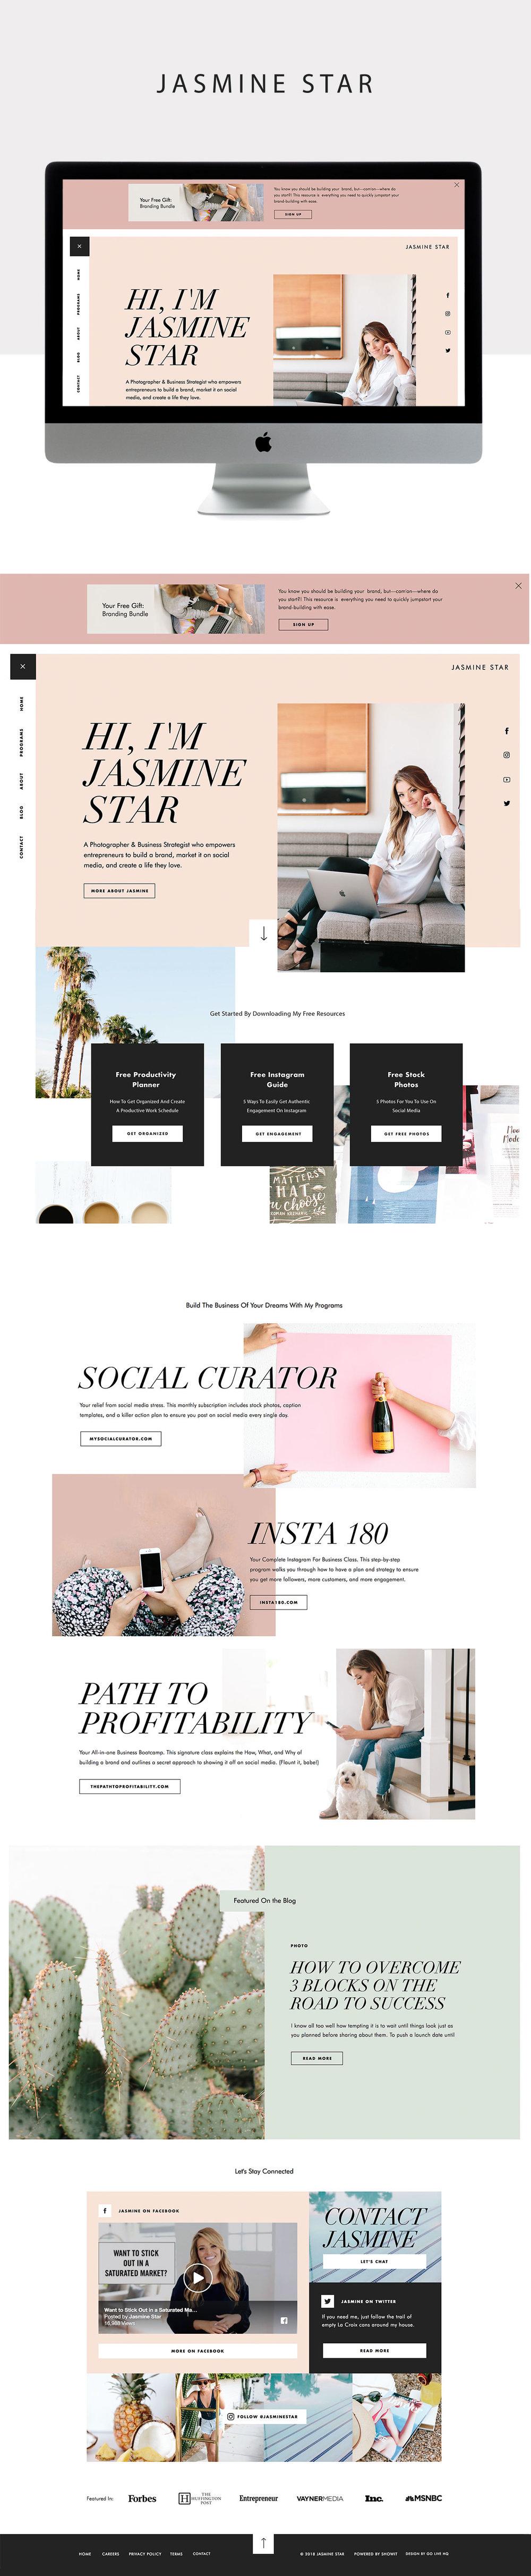 Dynamic,+Bold,+Professional+Website+Design+for+Creative+Entrepreneur+_+Design+by+Go+Live+HQ.jpg